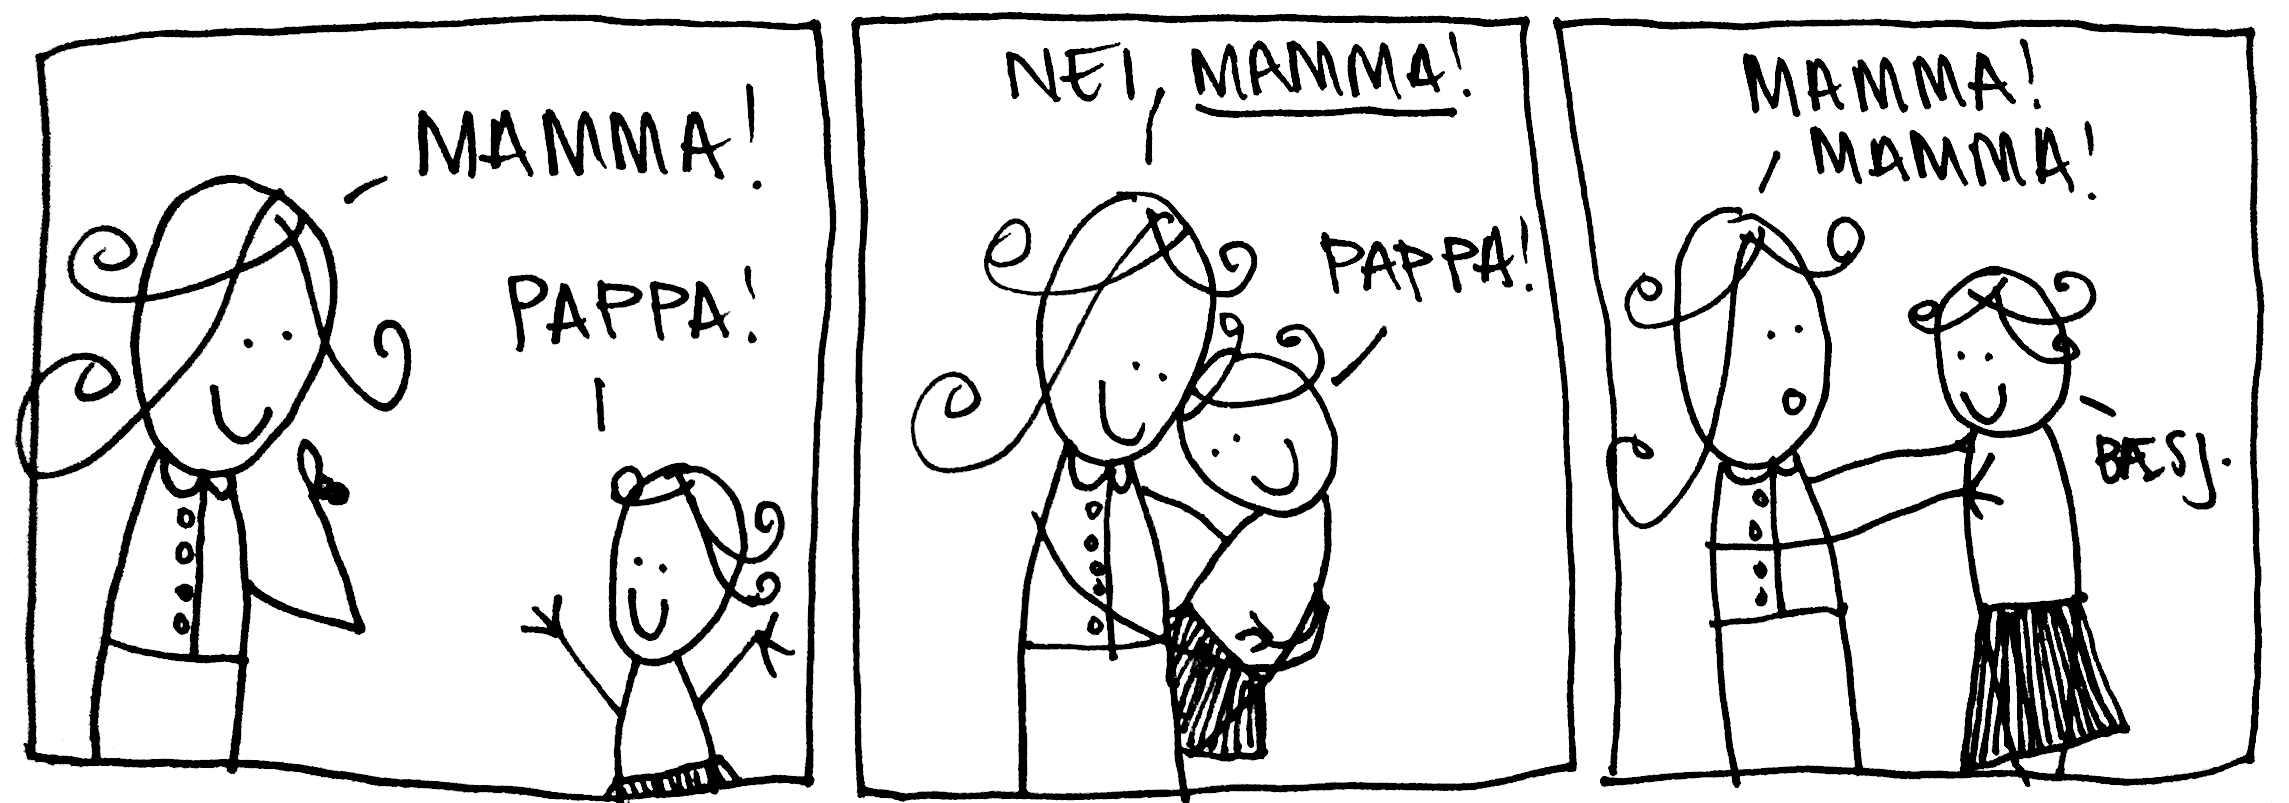 Mamma! pappa! Nei, mamma! Pappa! Mamma, mamma! Bæsj.